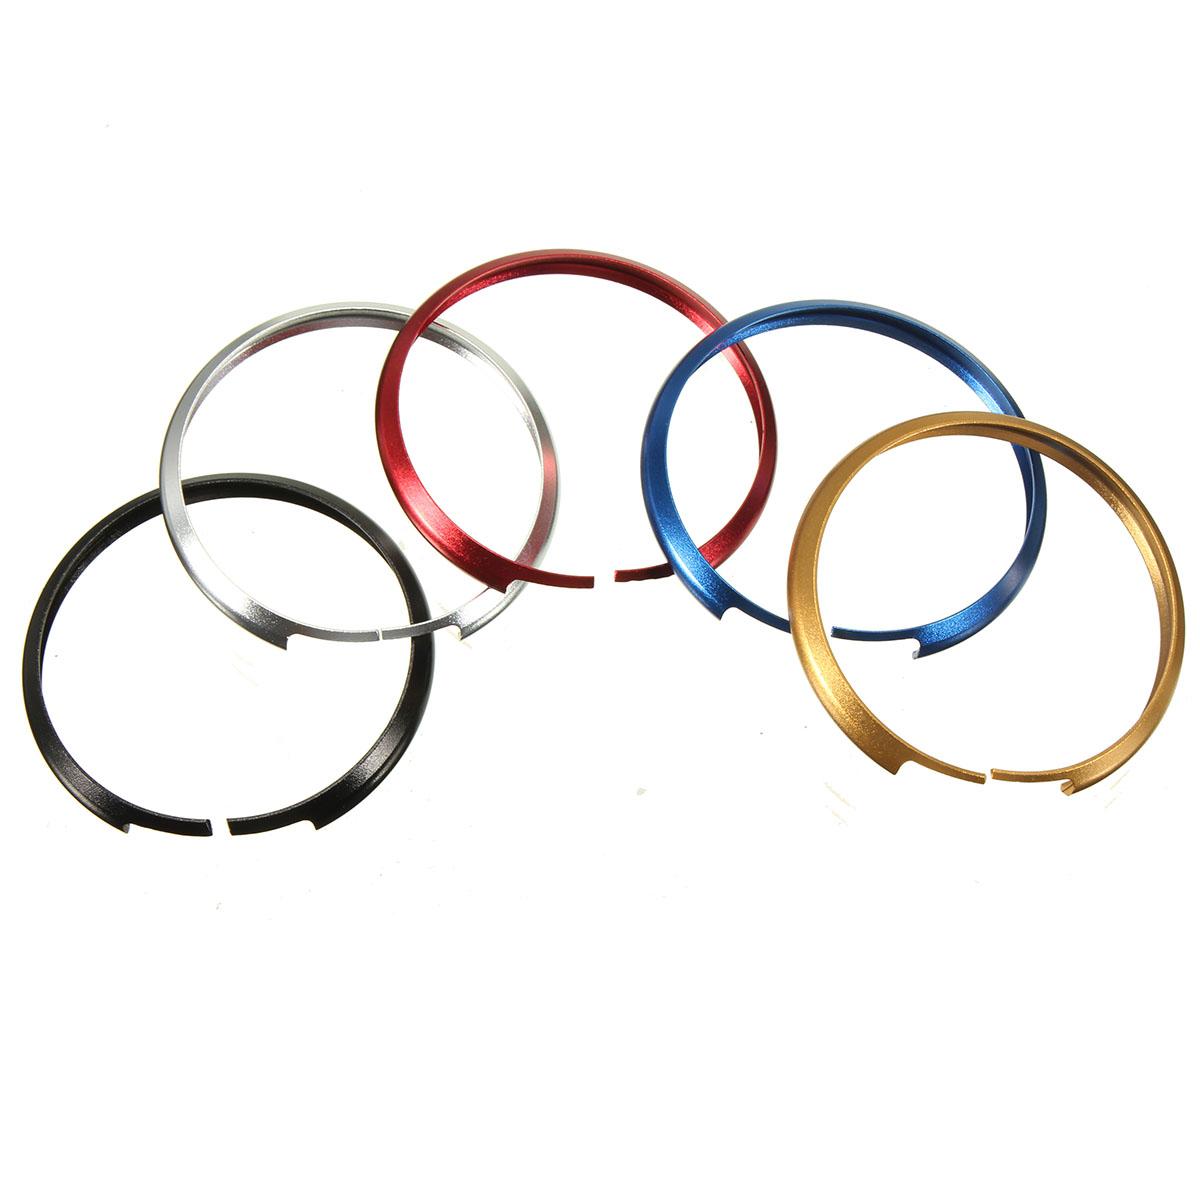 2015 New Aluminum Alloy Remote Key rings Decorative Ring Trim for MINI Cooper for JCW R55 R56 R57 R58 R59 R60<br><br>Aliexpress